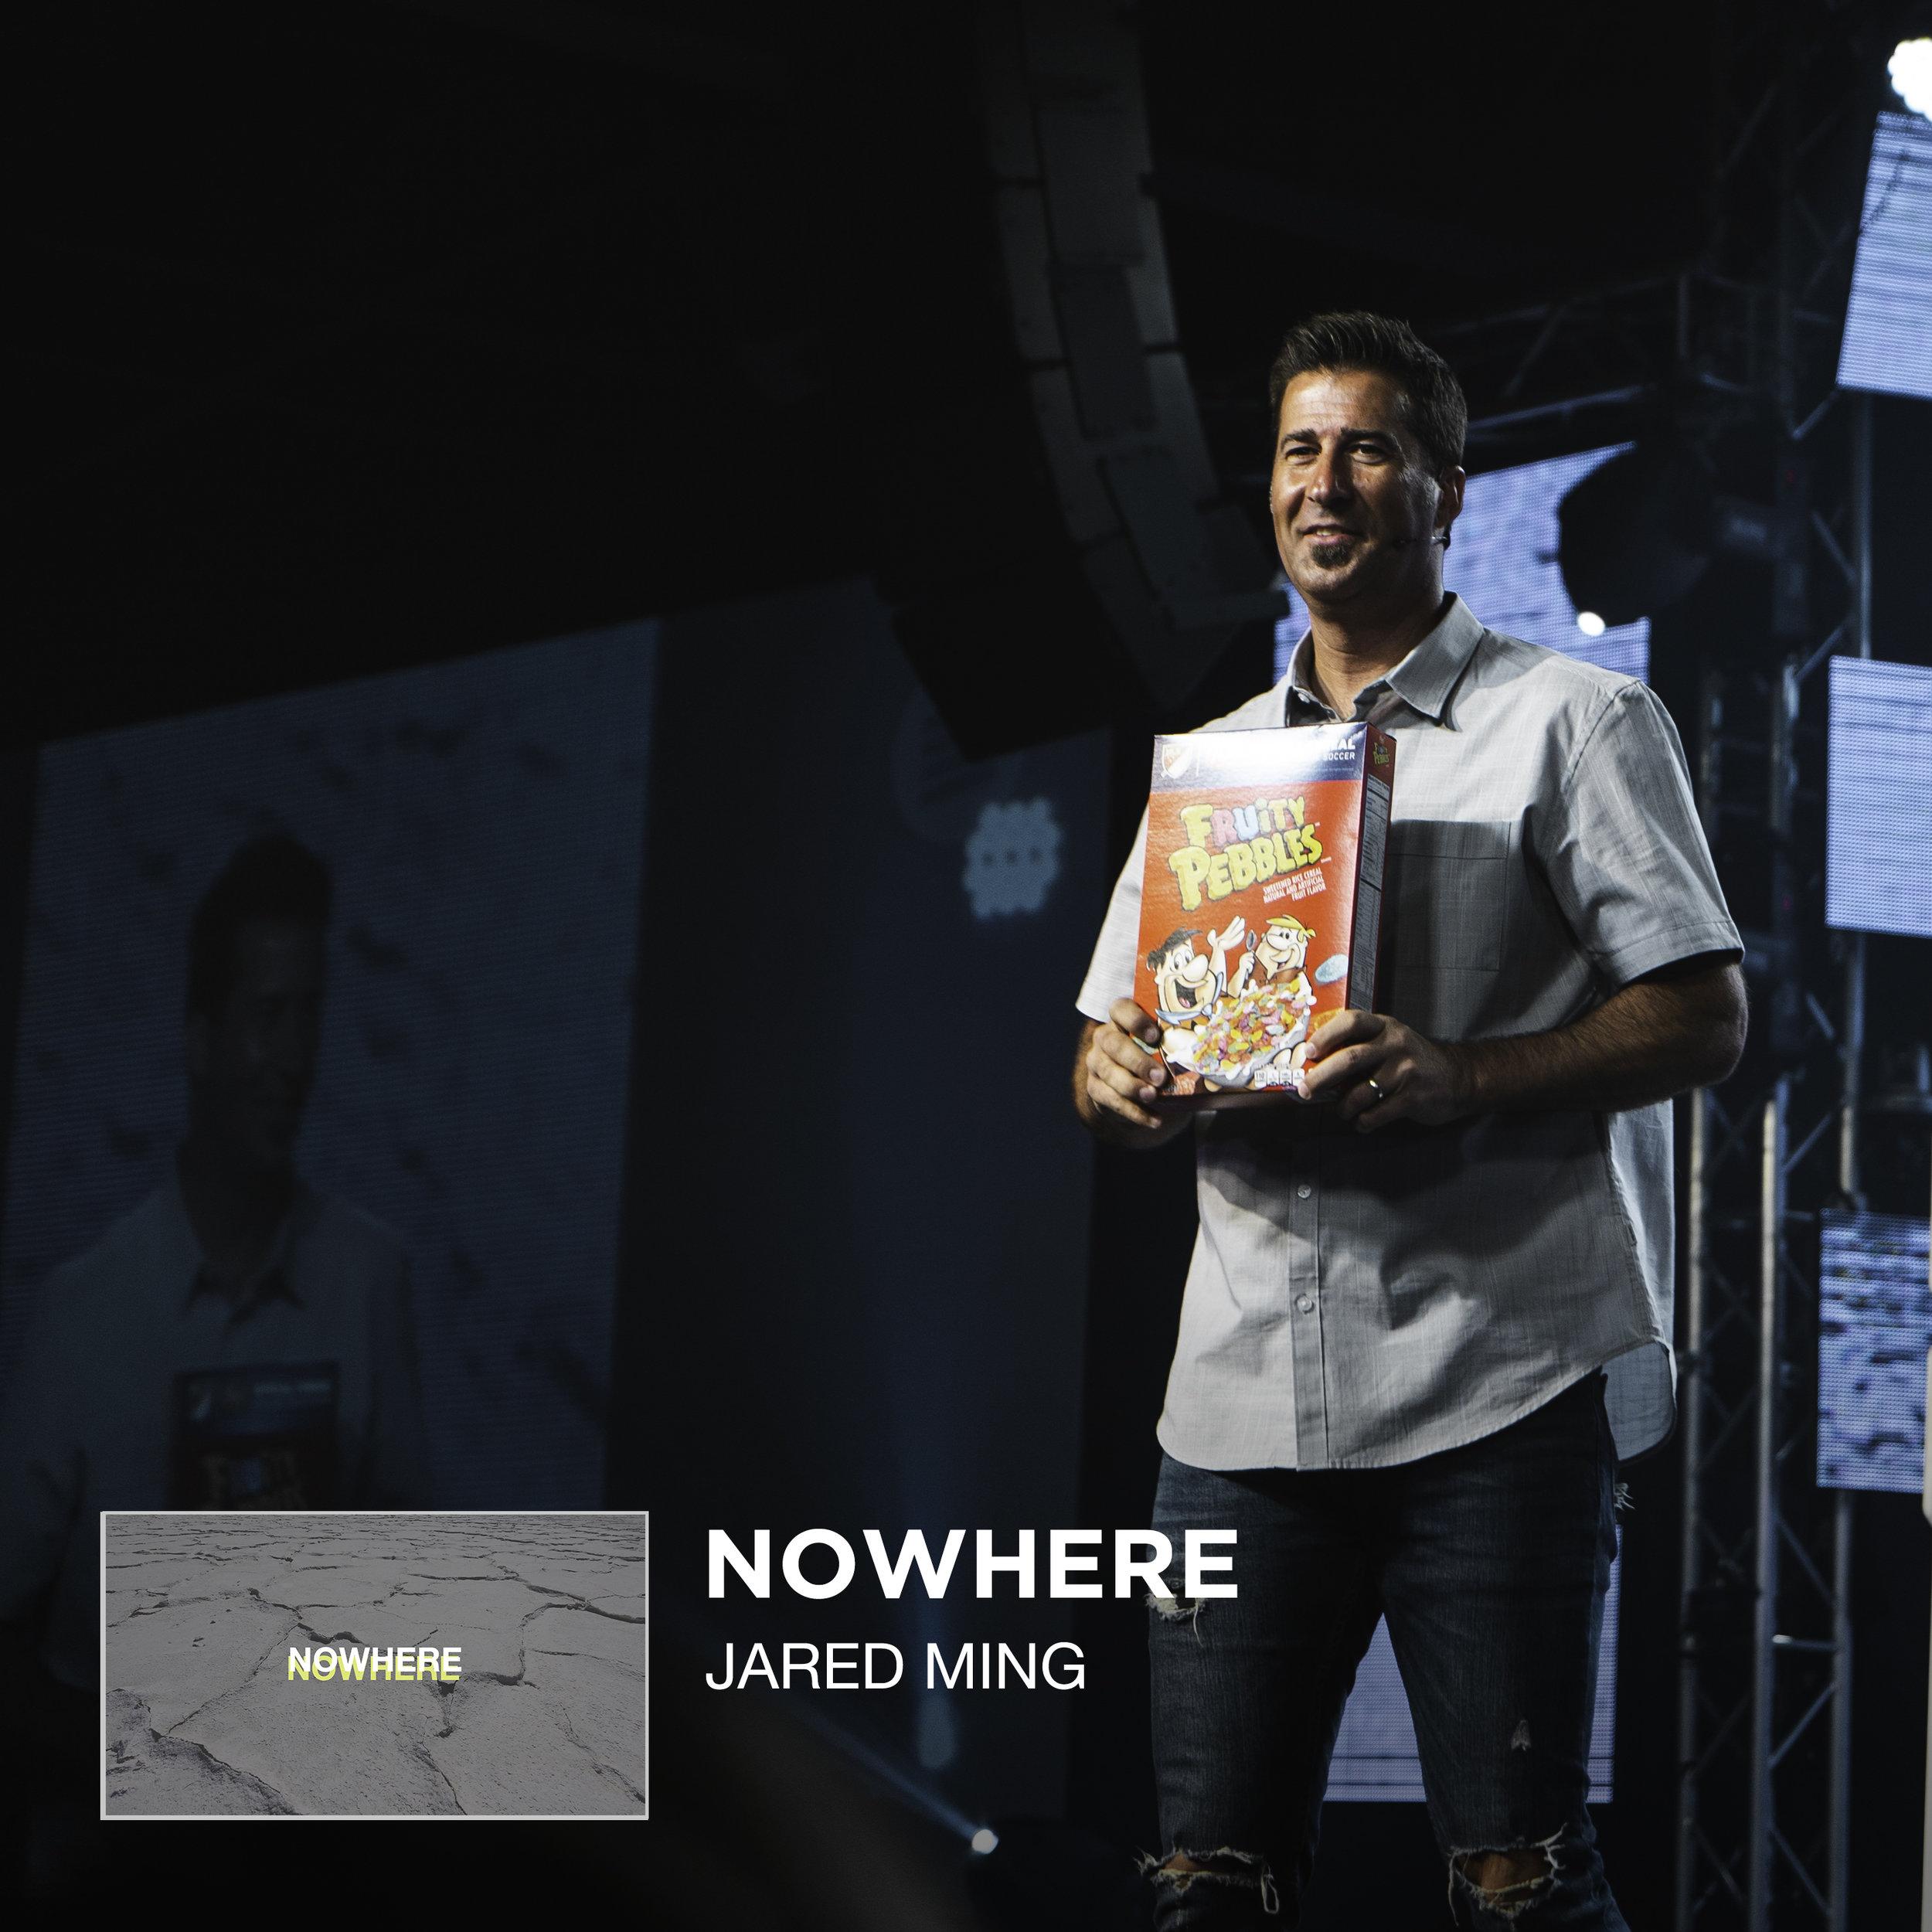 Nowhere - Jared Ming Web.jpg